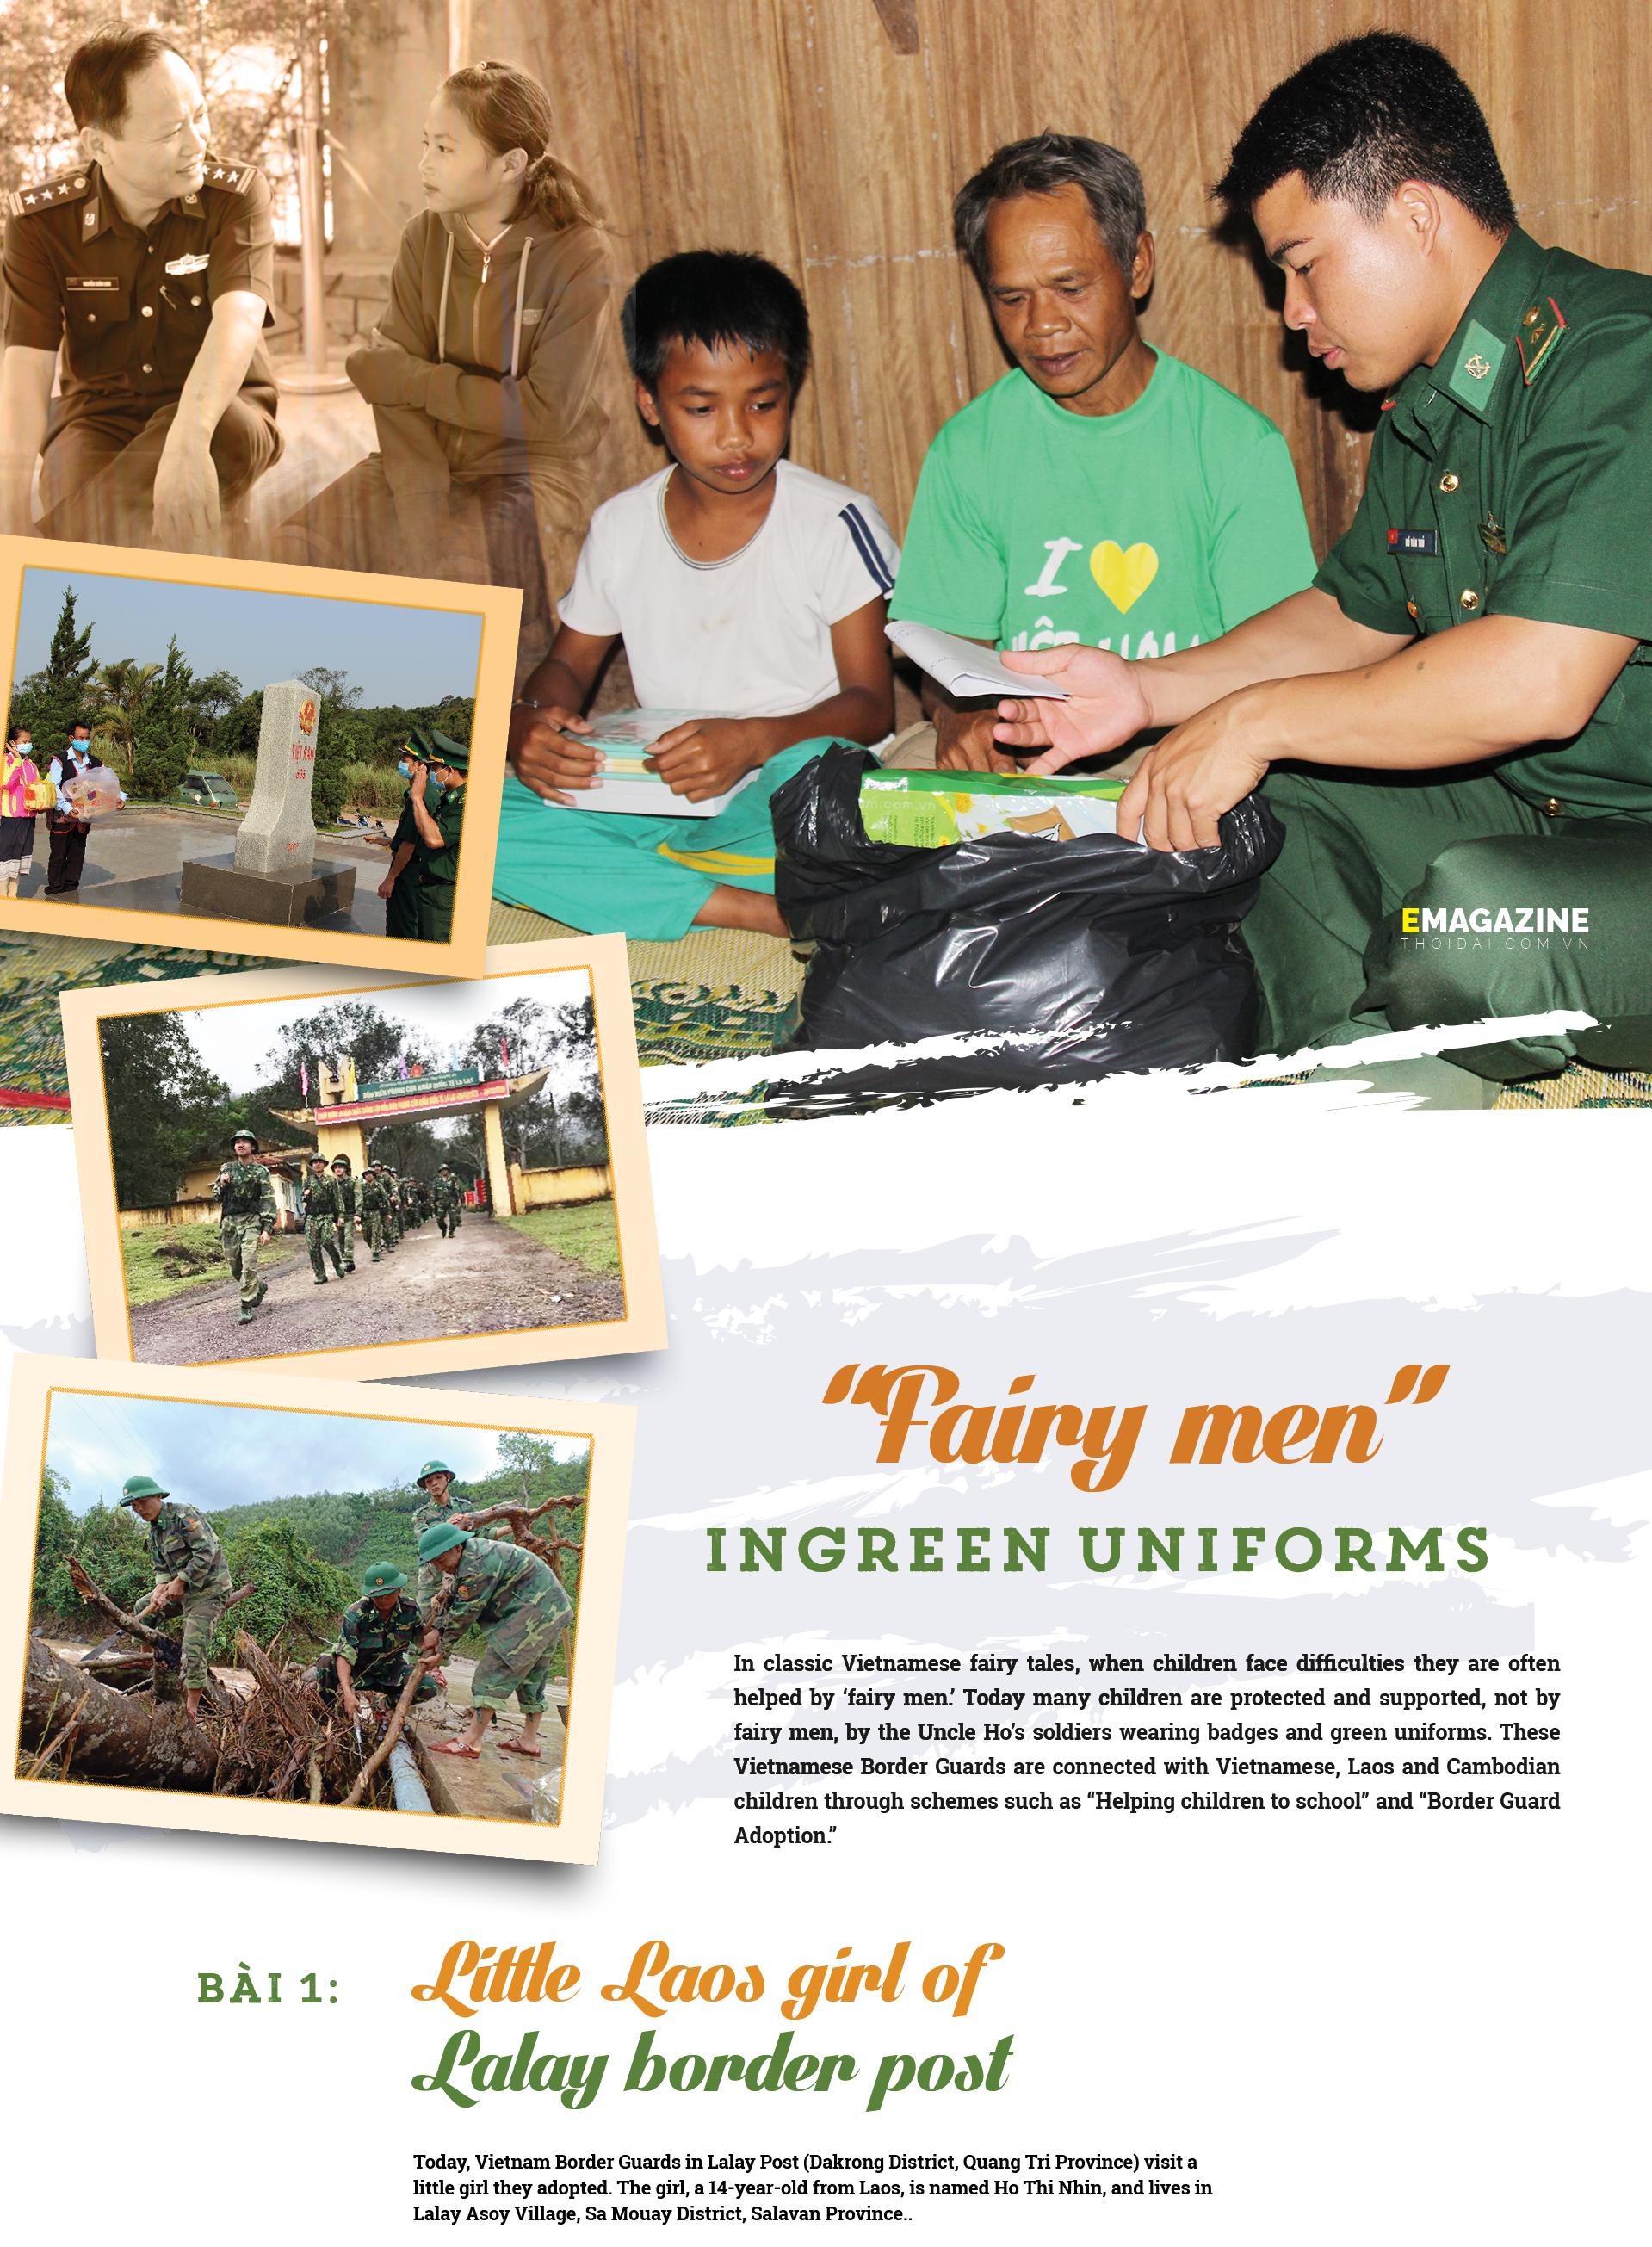 Fairy men in green uniforms